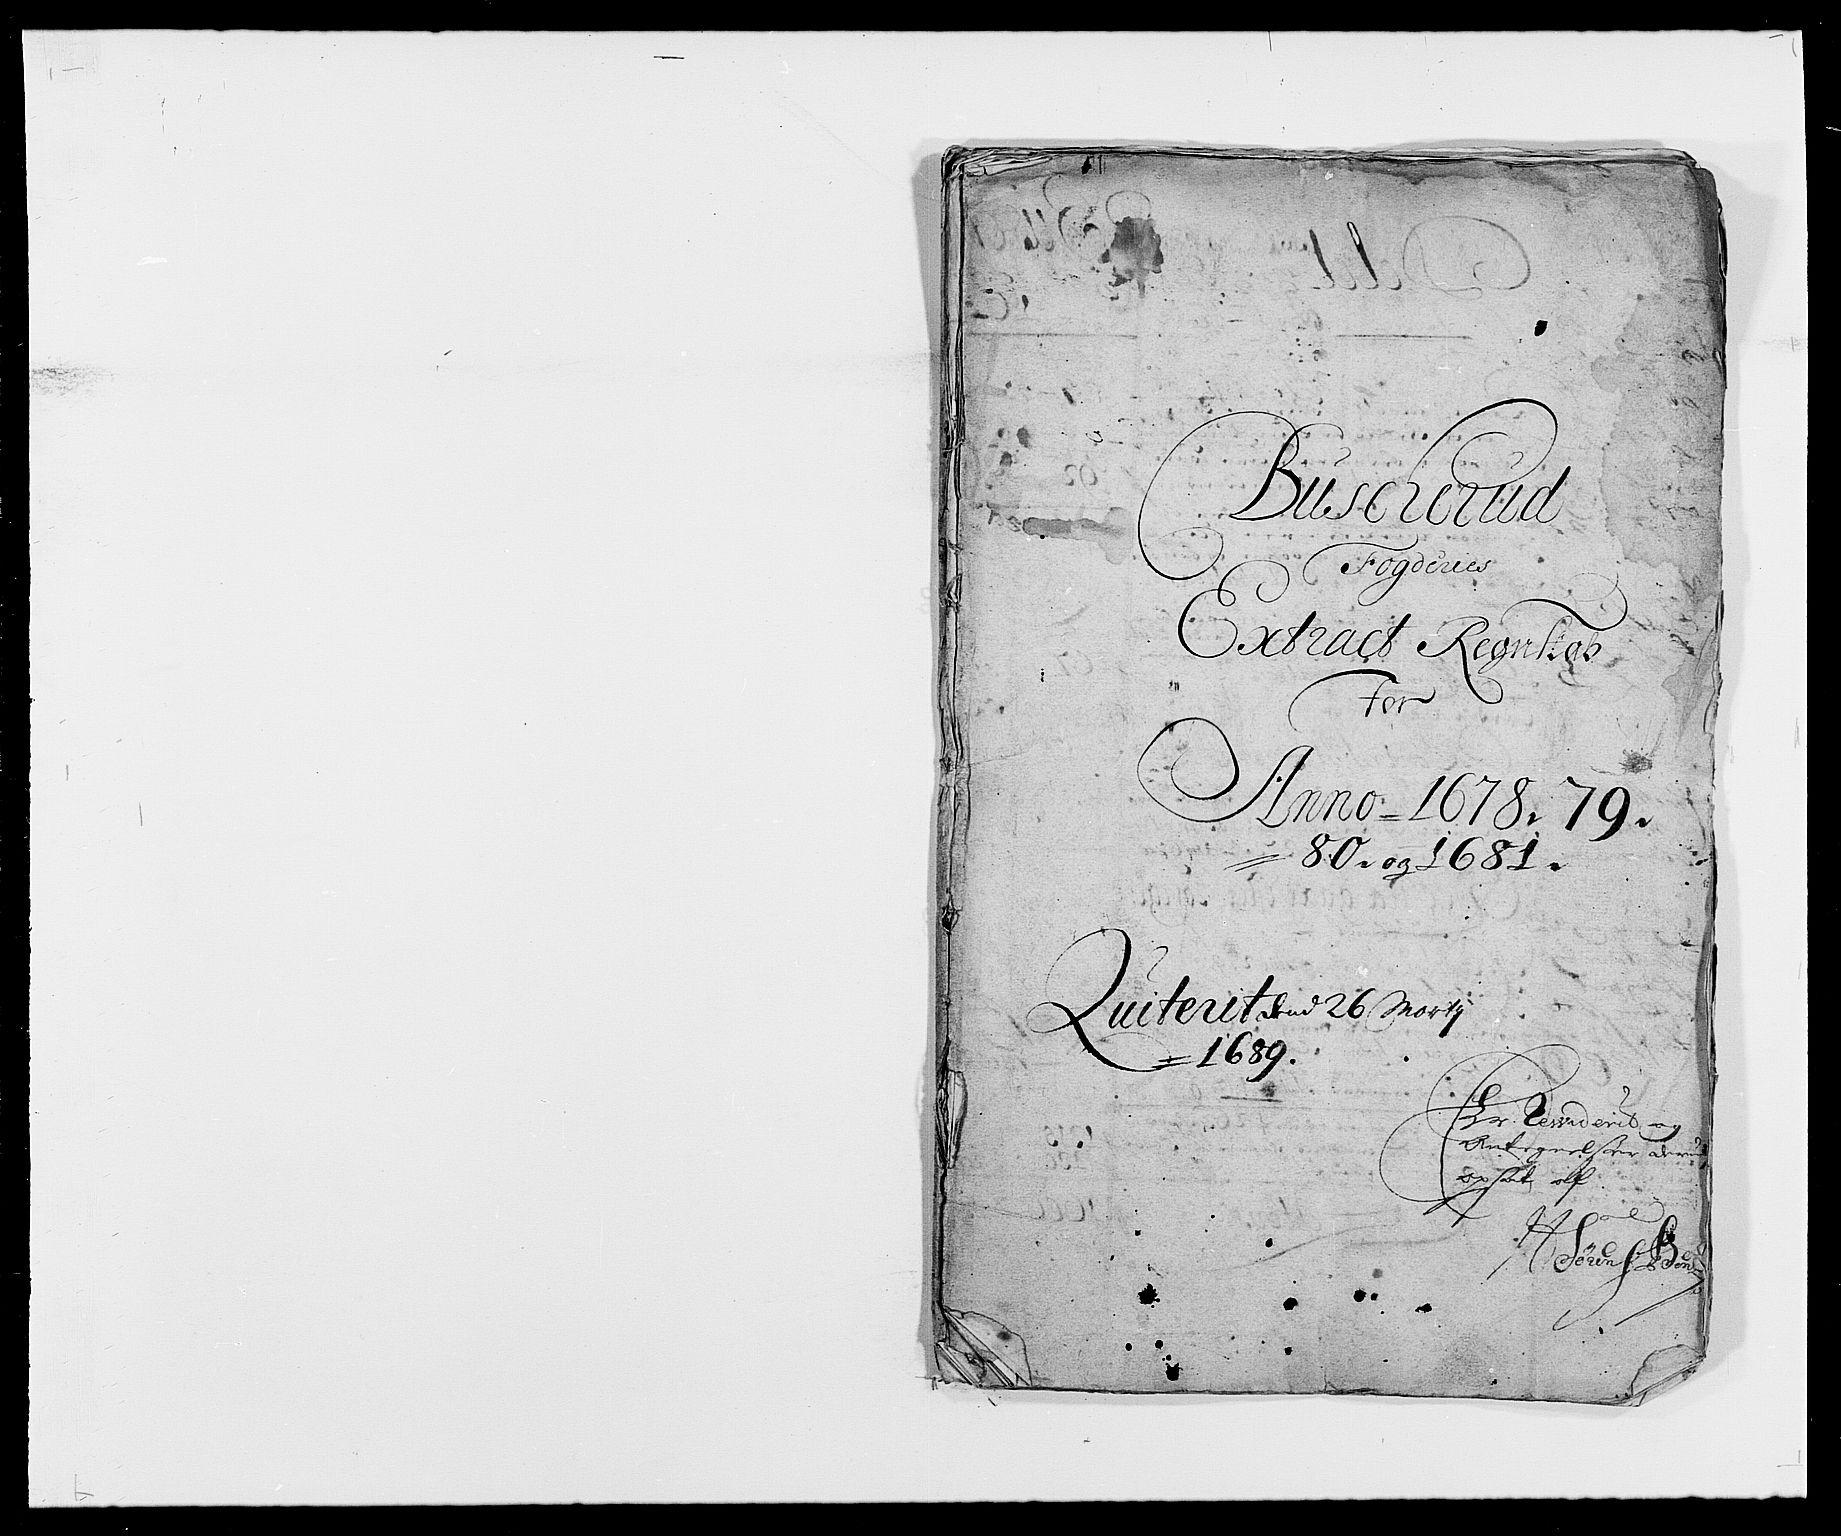 RA, Rentekammeret inntil 1814, Reviderte regnskaper, Fogderegnskap, R25/L1674: Fogderegnskap Buskerud, 1678-1681, s. 2